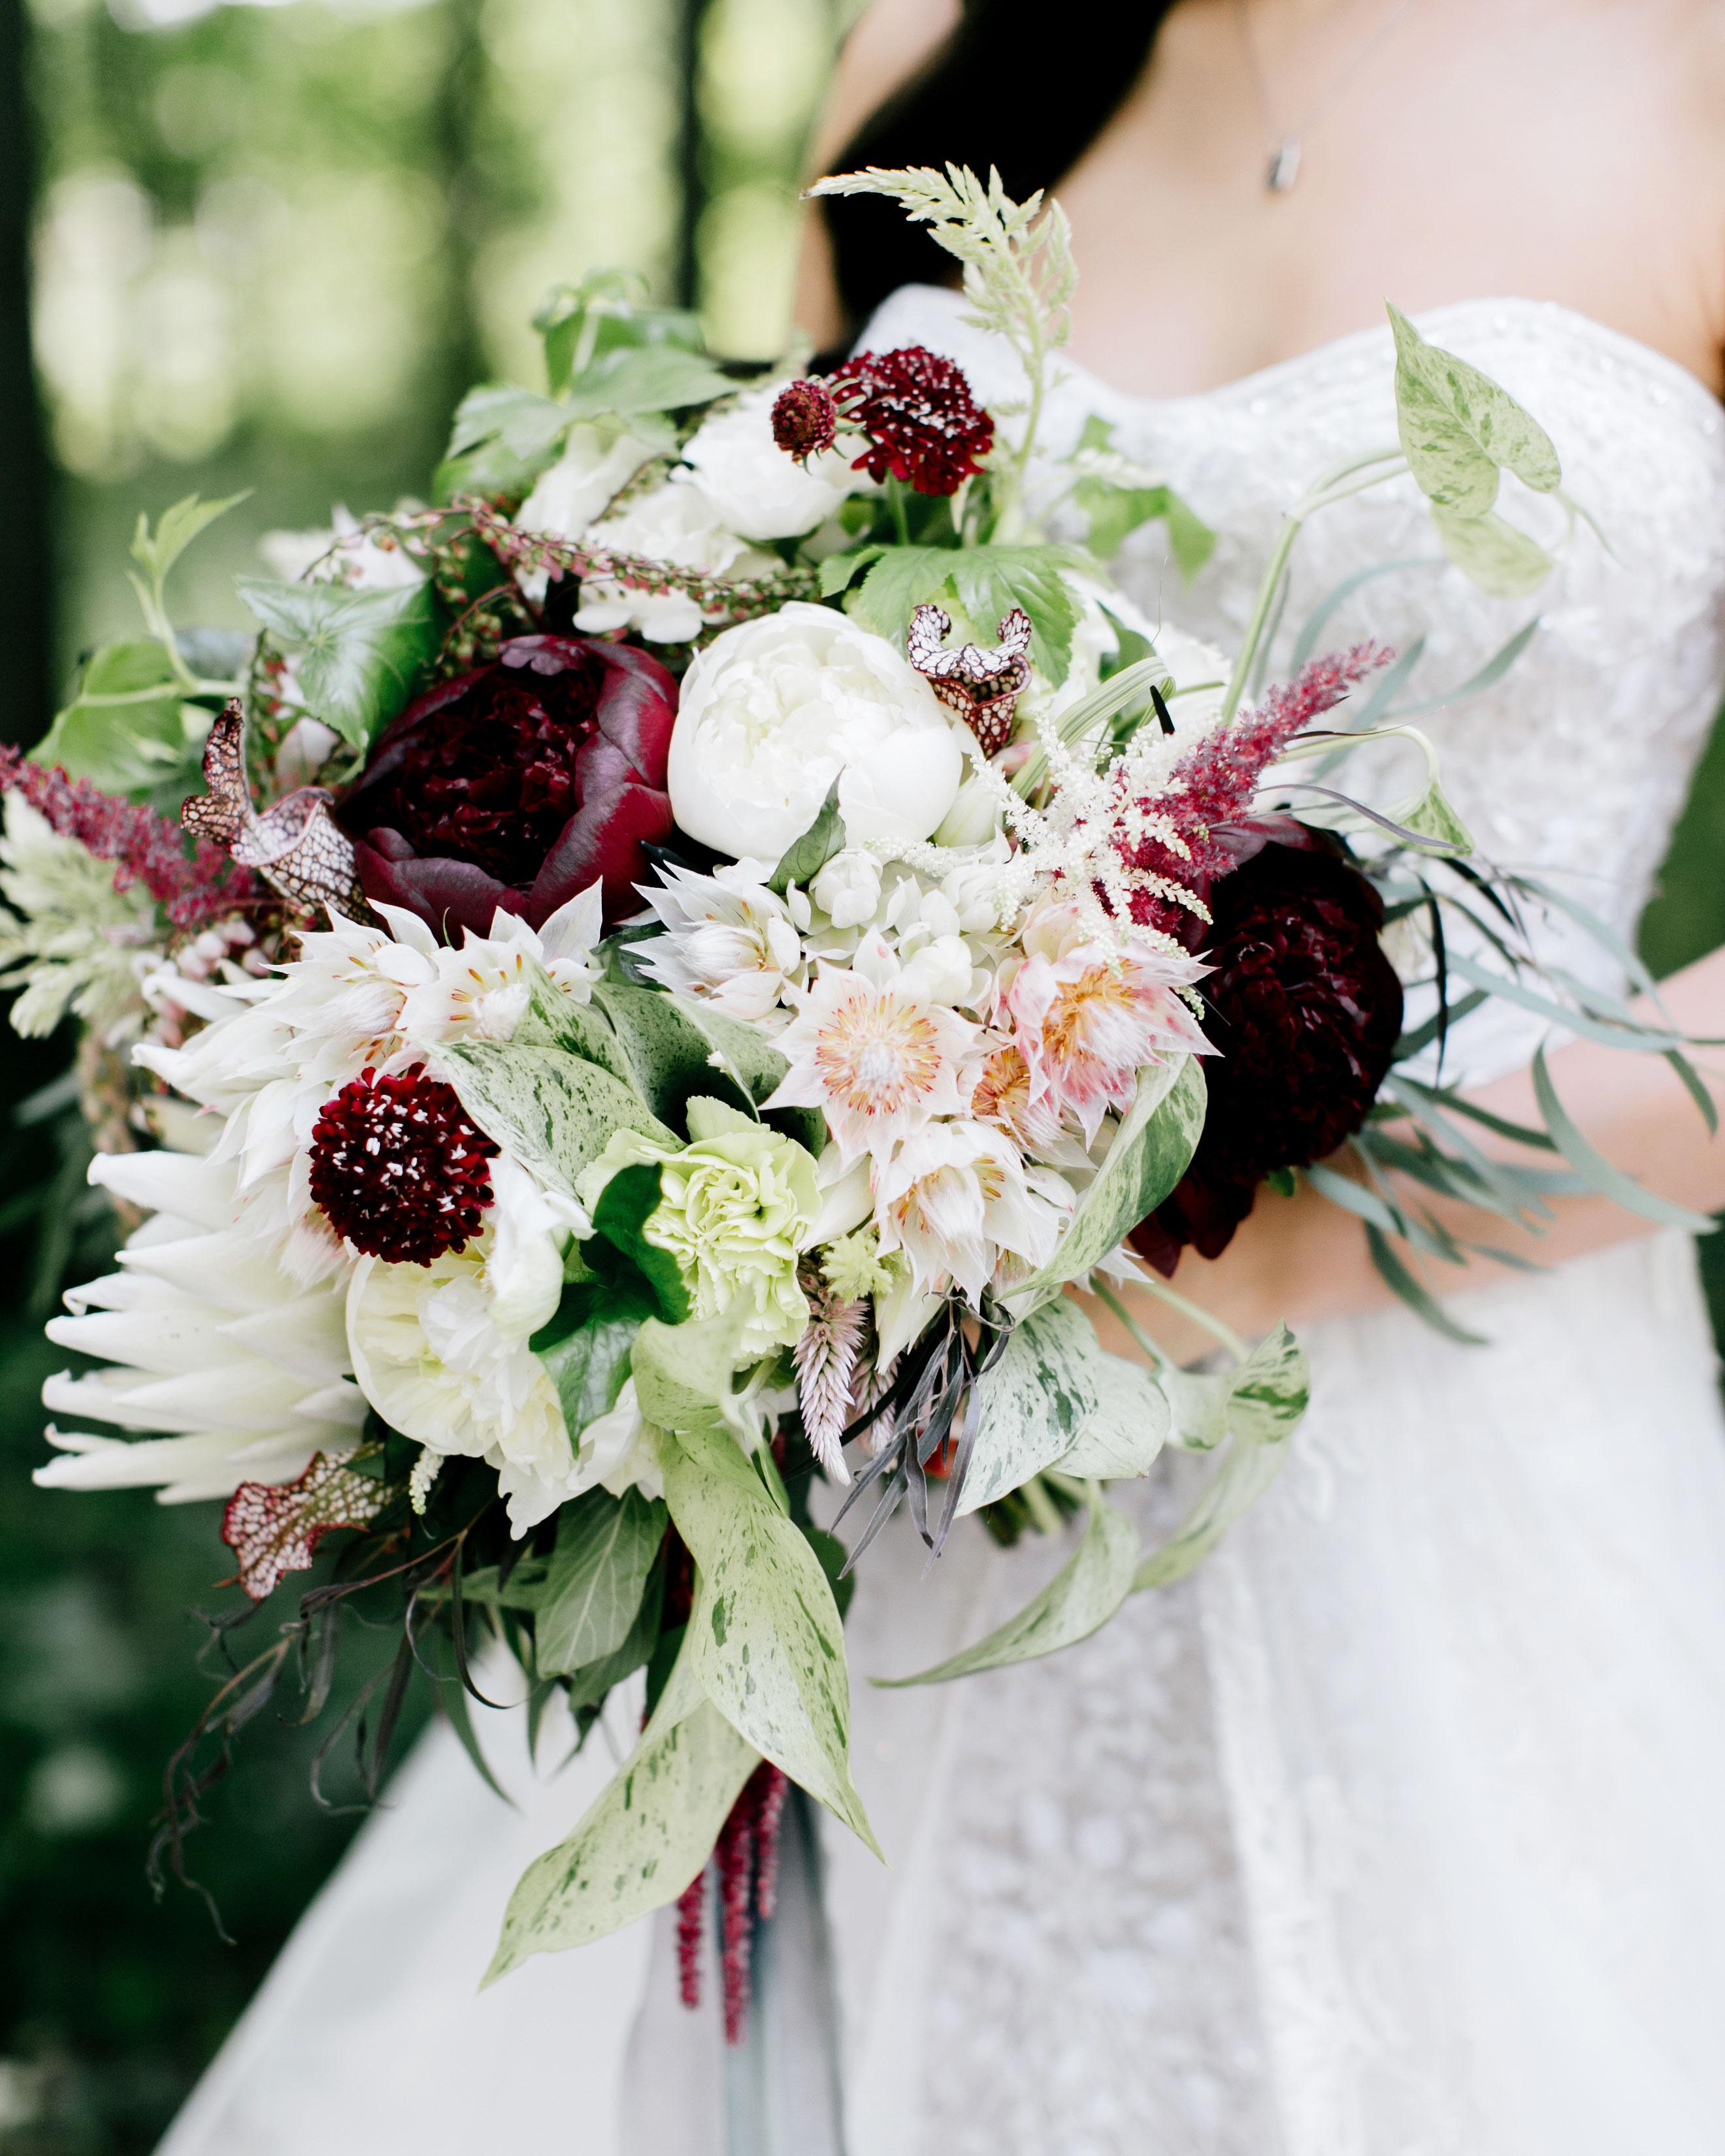 susan-tom-wedding-bouquet-050-s112692-0316.jpg